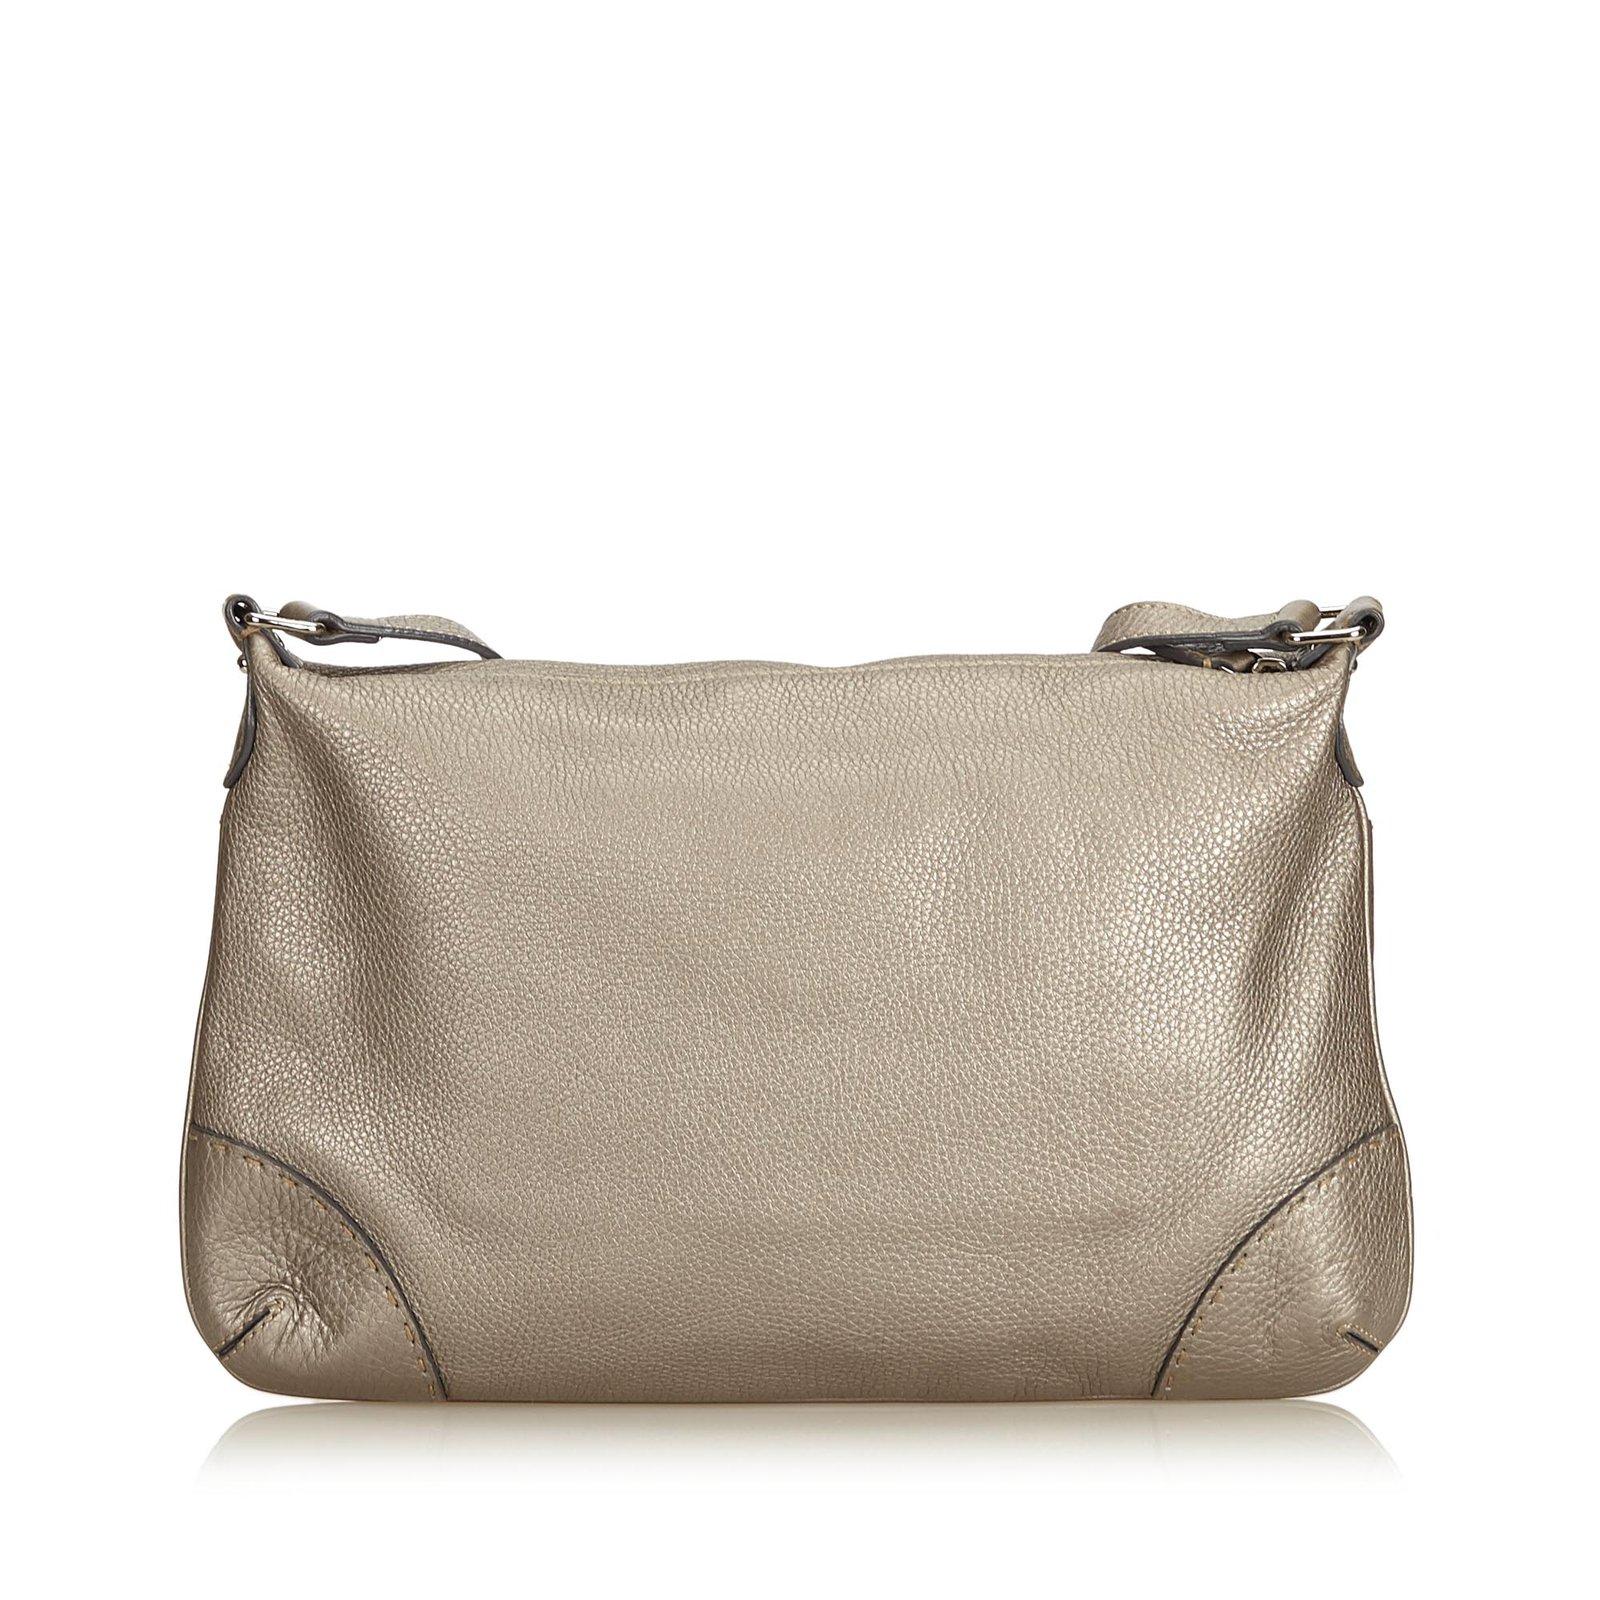 7df90177e616 Fendi Leather Selleria Crossbody Bag Handbags Leather